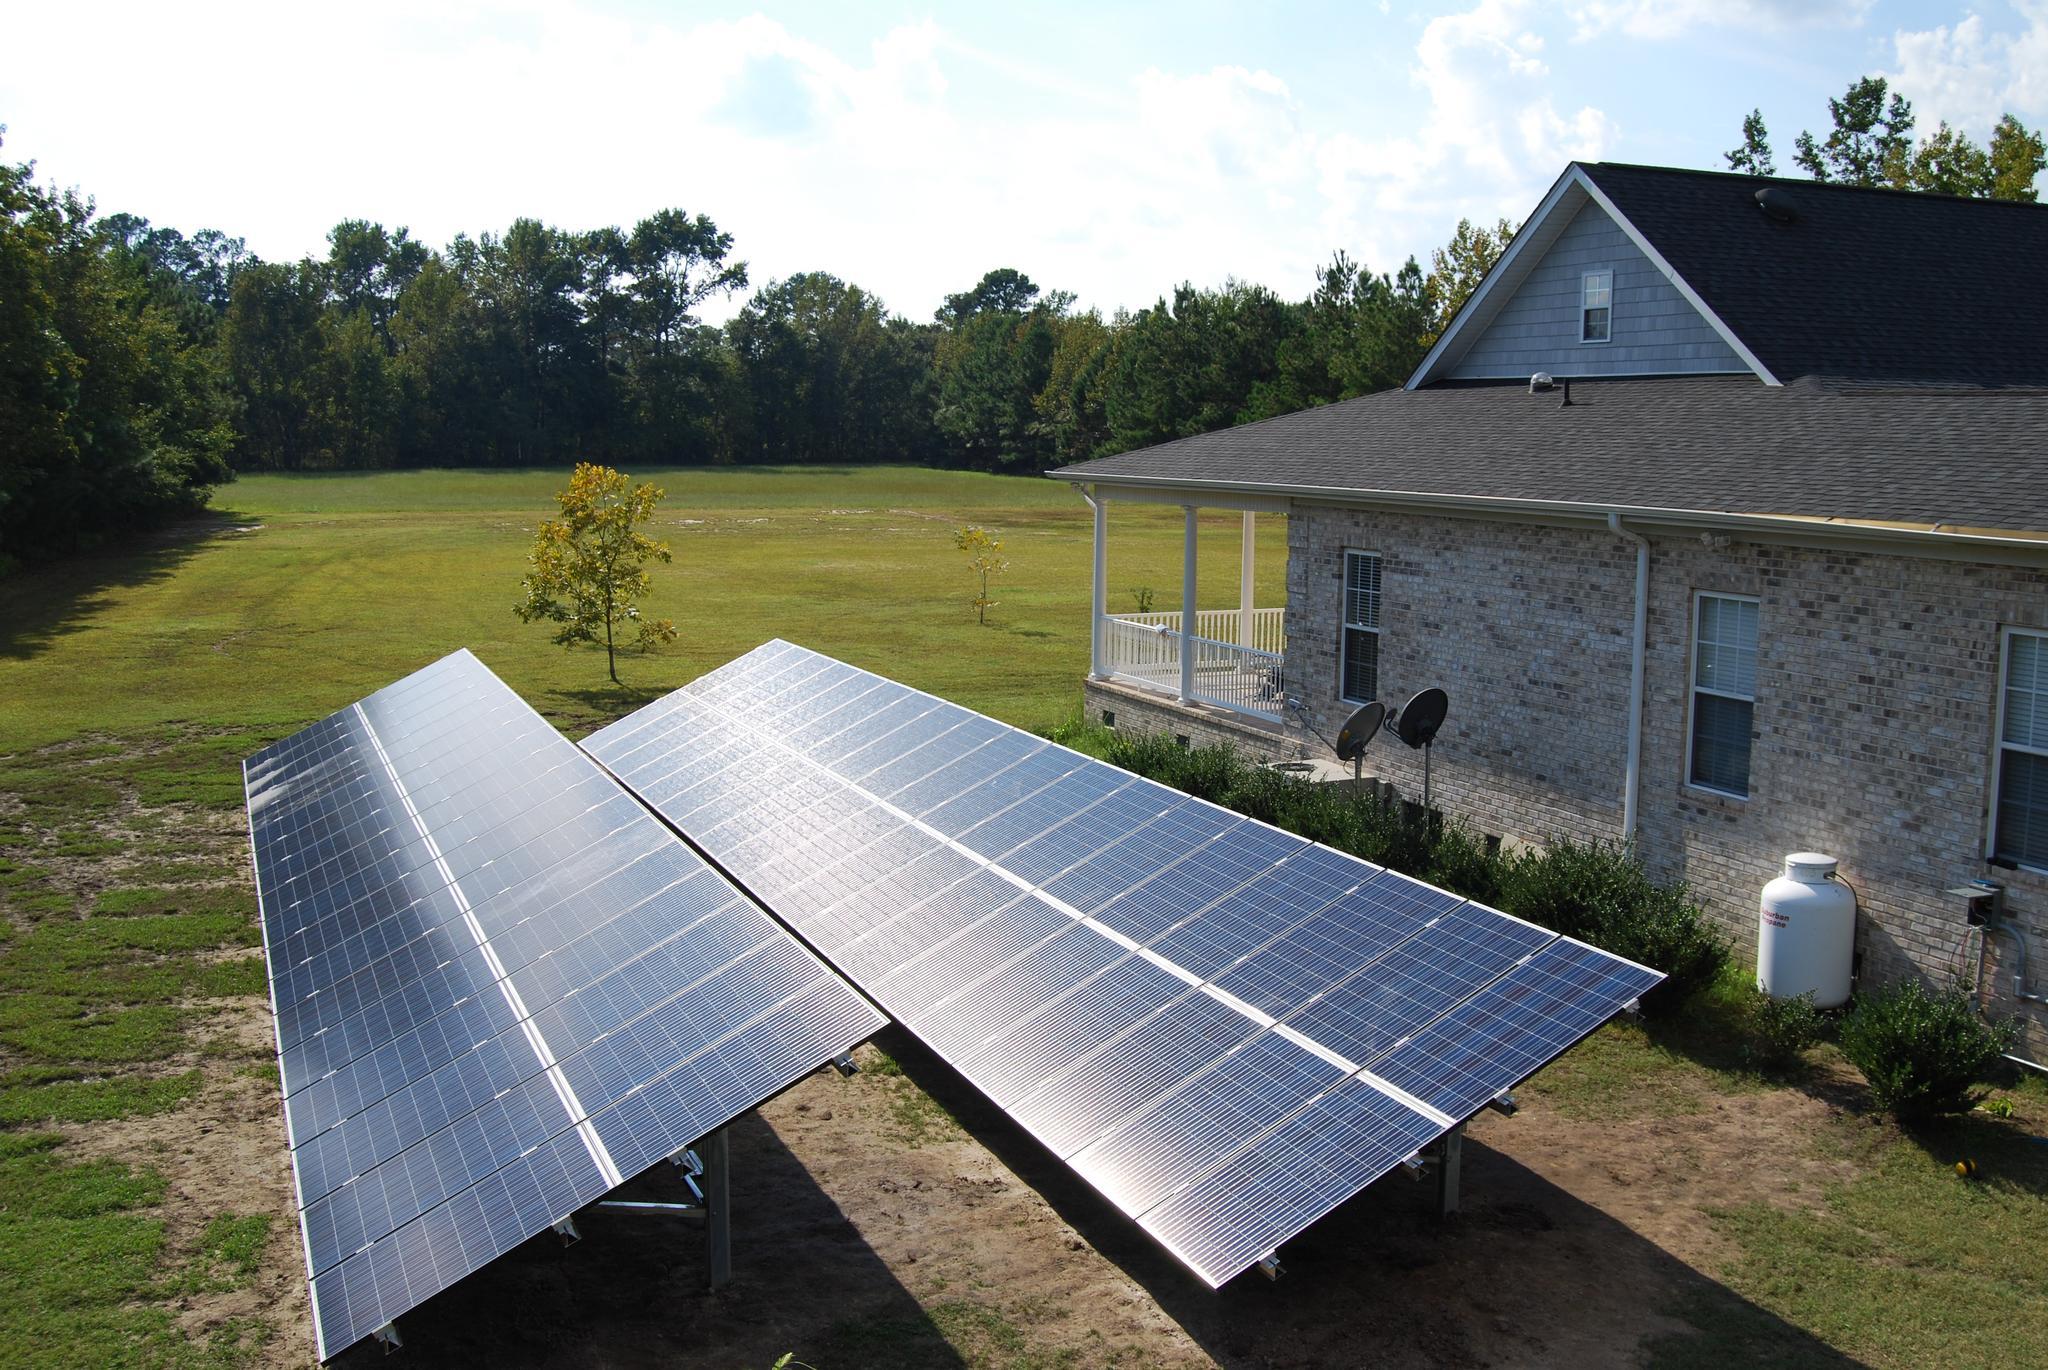 Southern Current Llc Profile Amp Reviews 2019 Energysage